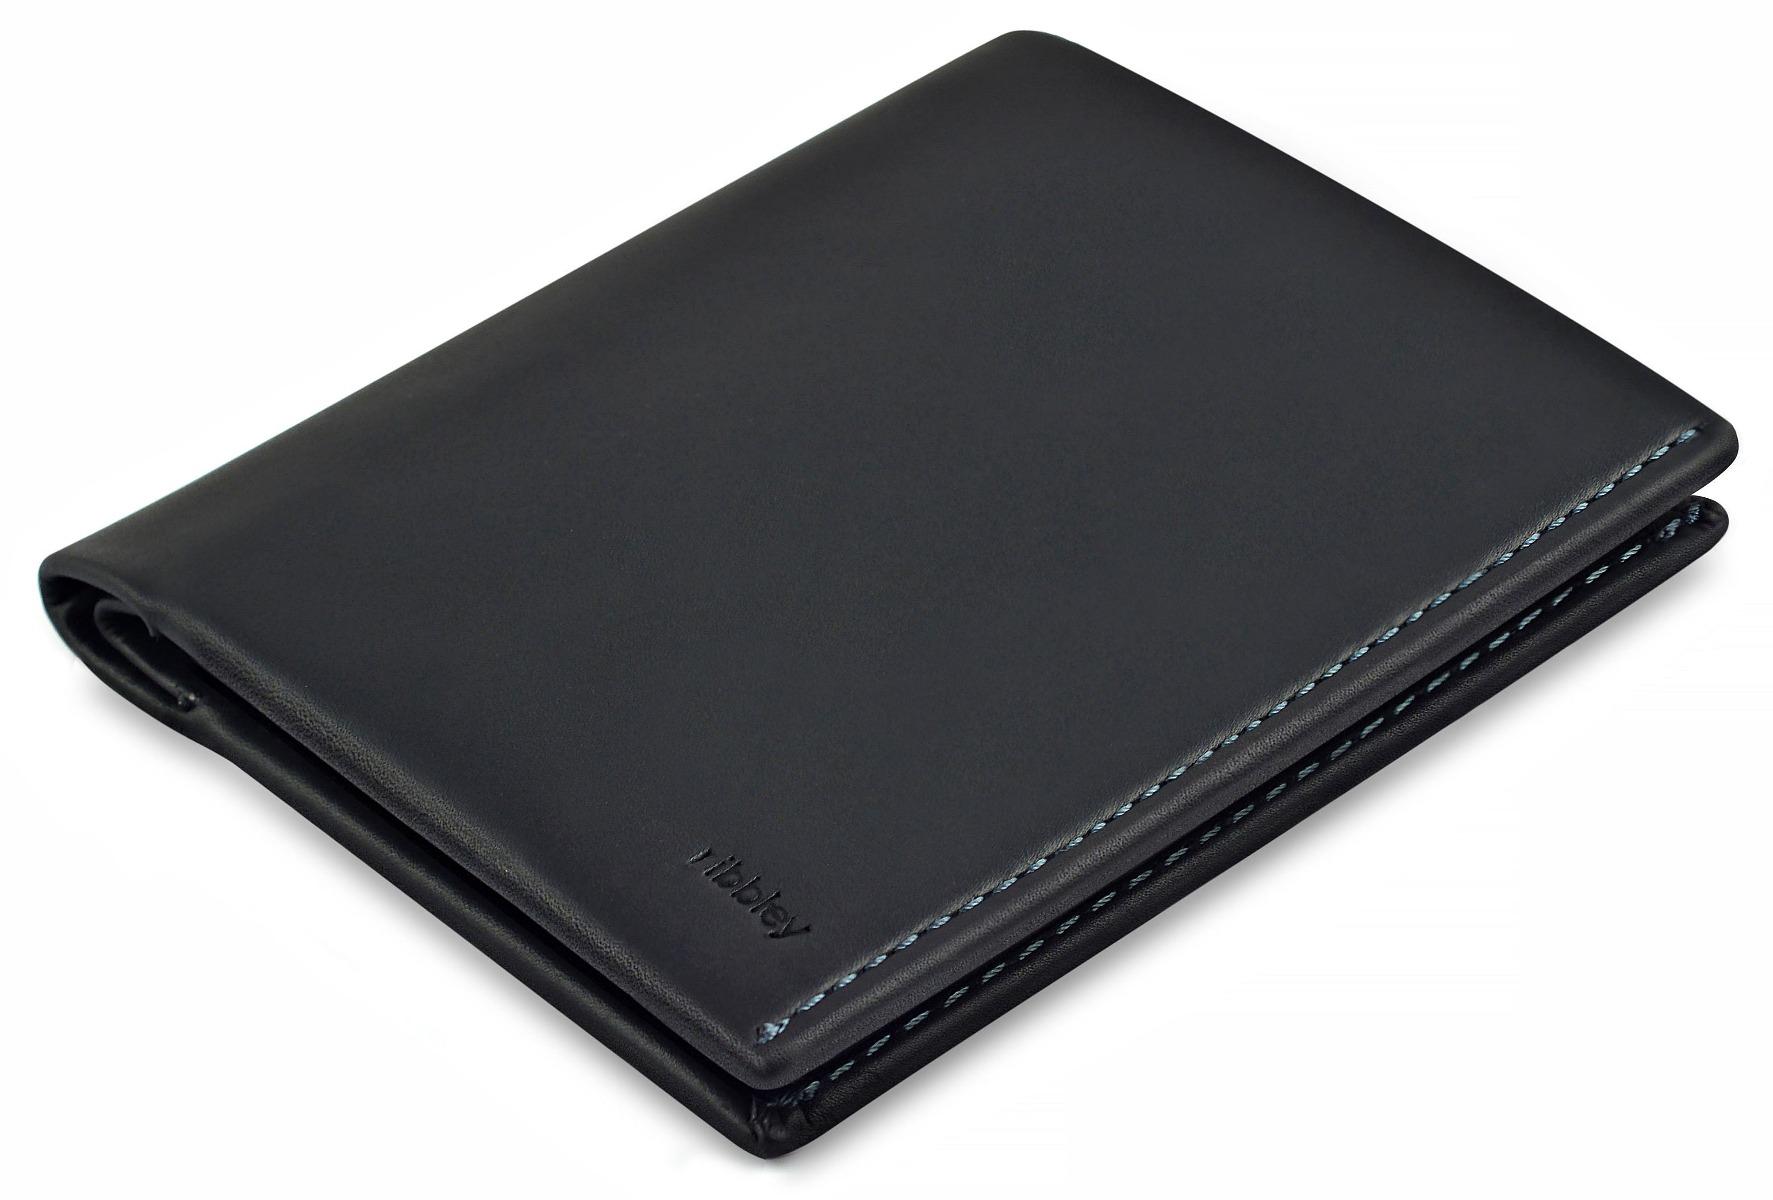 męskie skórzane portfele ribbley